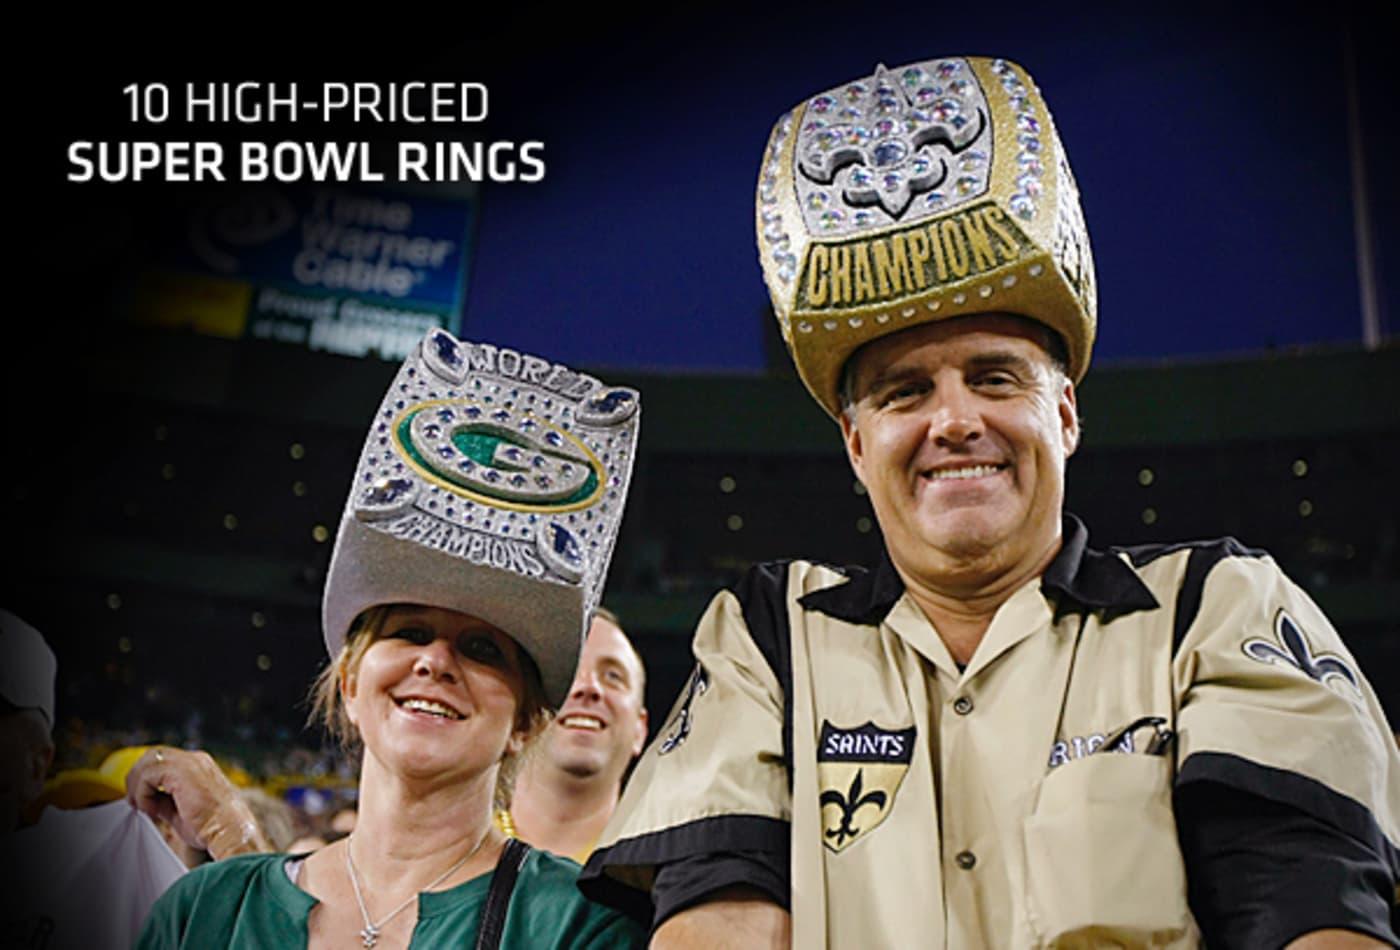 superbowl-rings-cover1.jpg